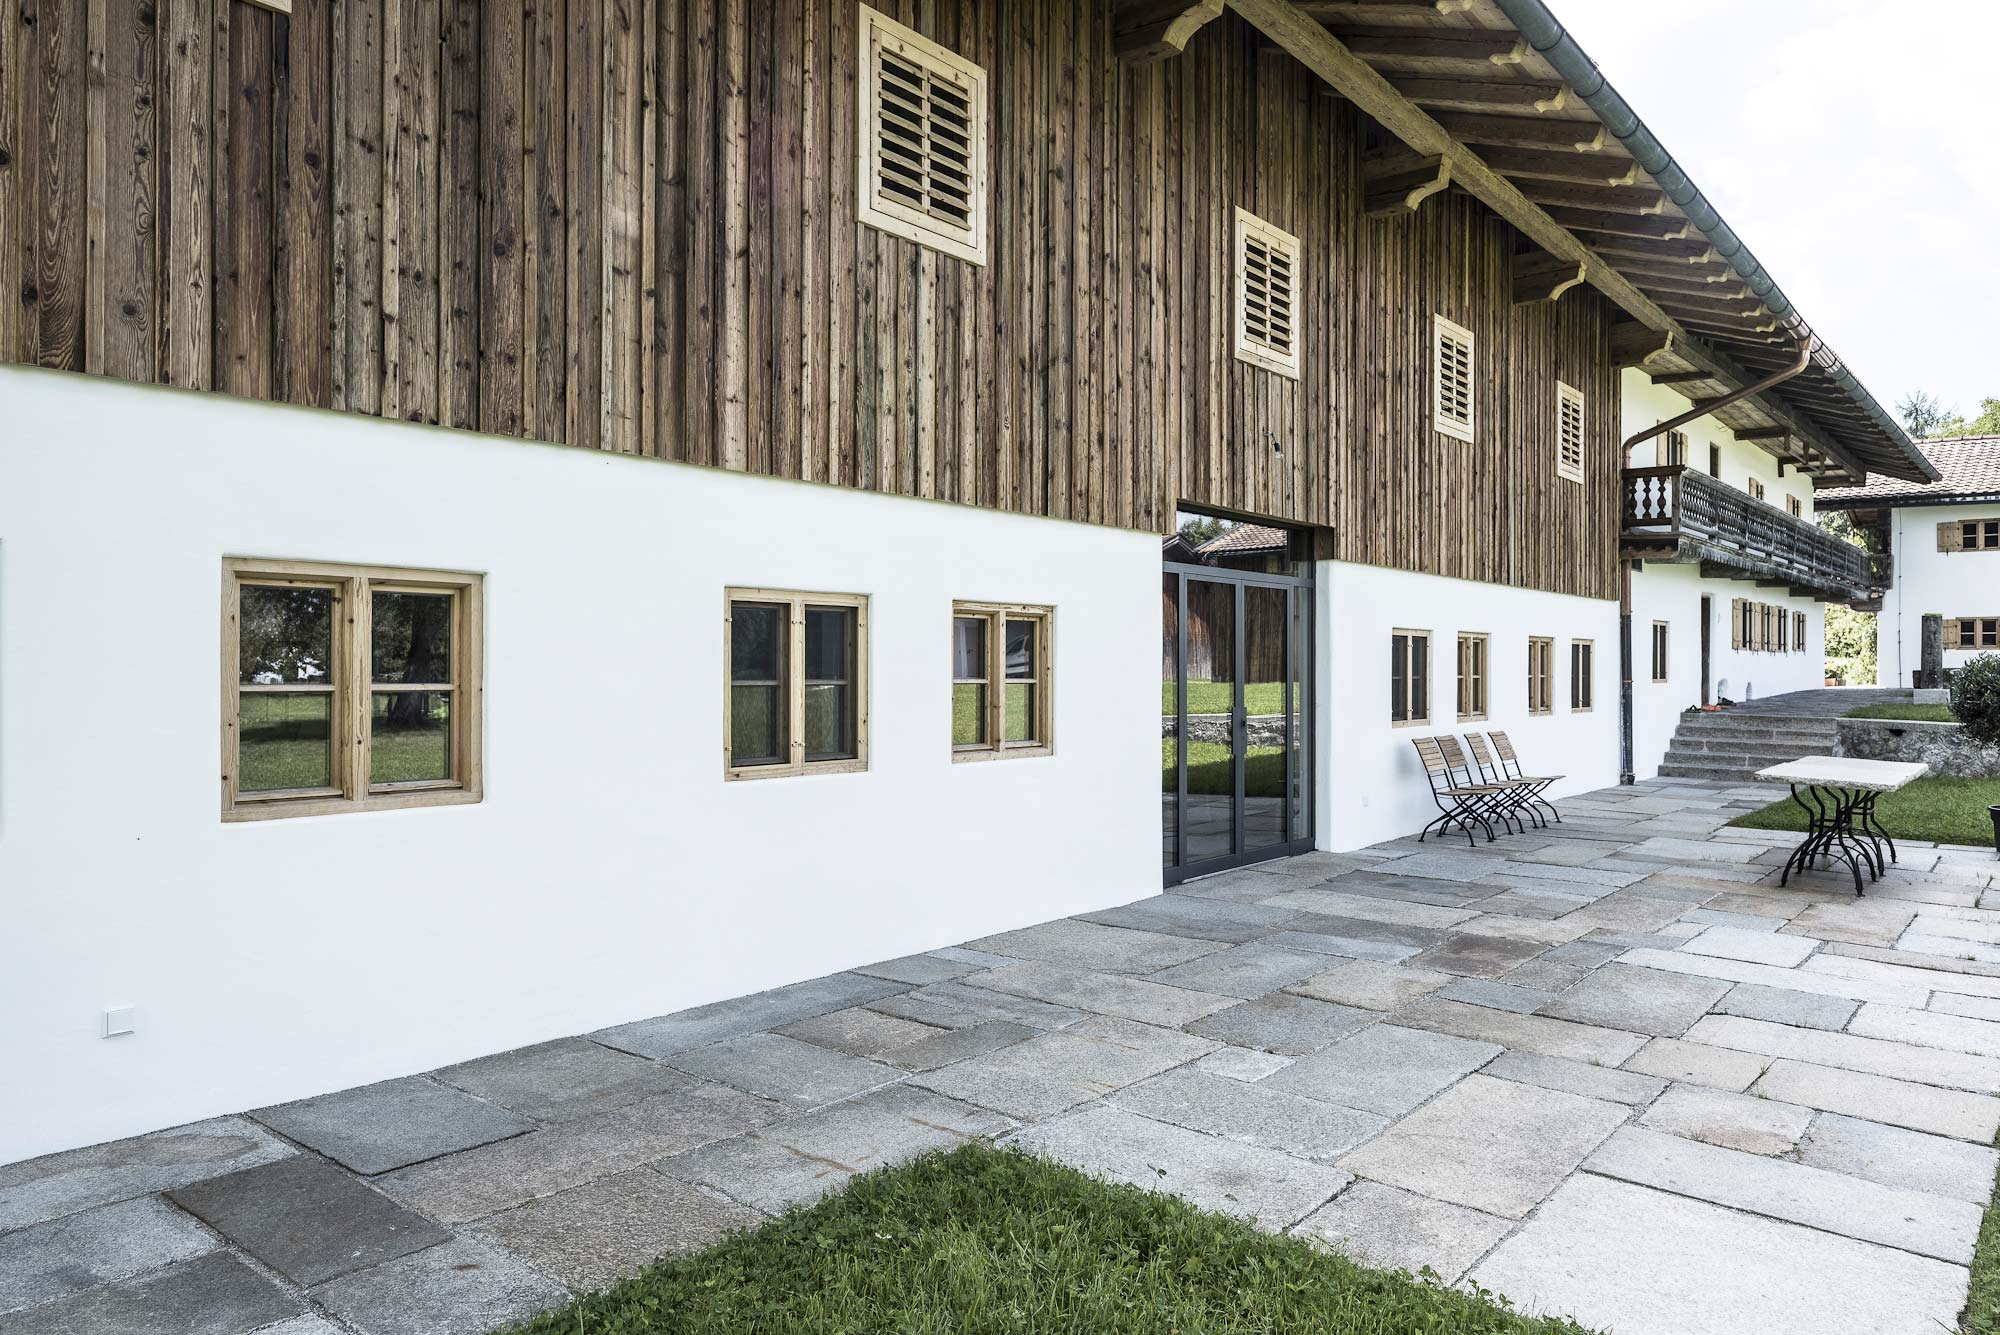 zimmerei-stoib-holzbau-sanierung-hof-umbau-altholz-innenausbau-festsaal-20.jpg